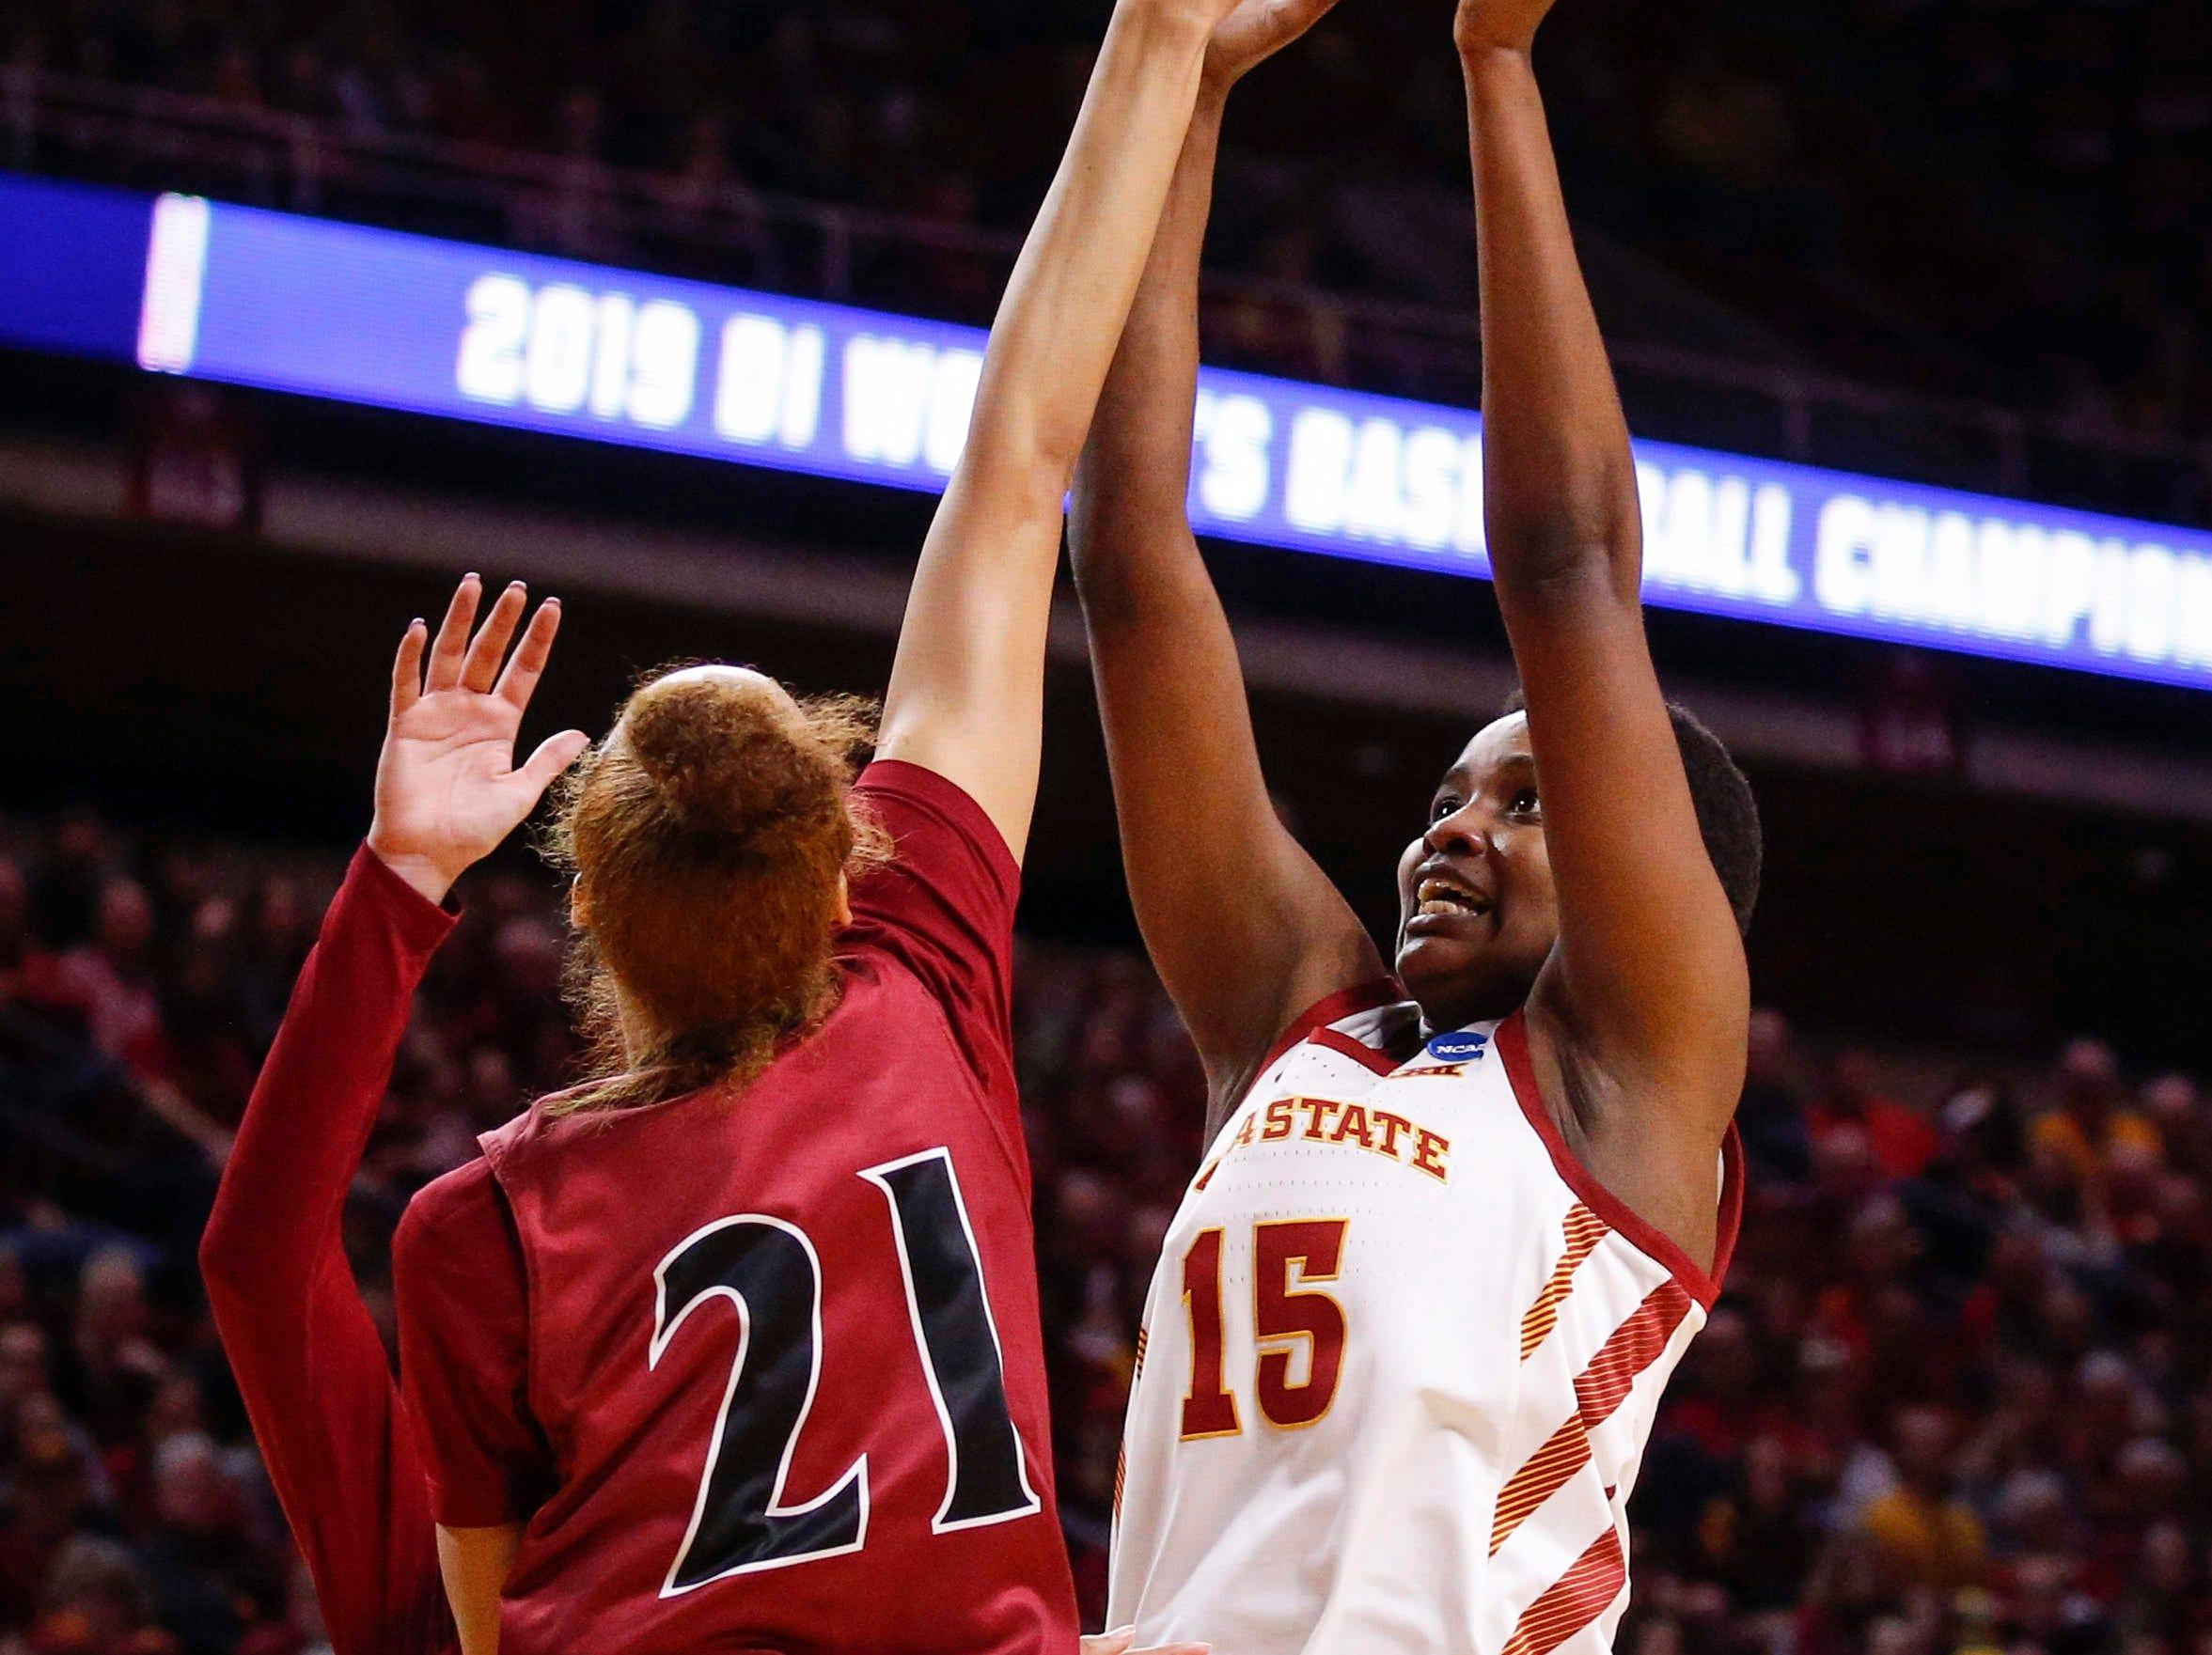 Iowa State senior Ines Nezerwa puts up a shot over New Mexico State senior Monique Mills on Saturday, March 23, 2019, at Hilton Coliseum in Ames.